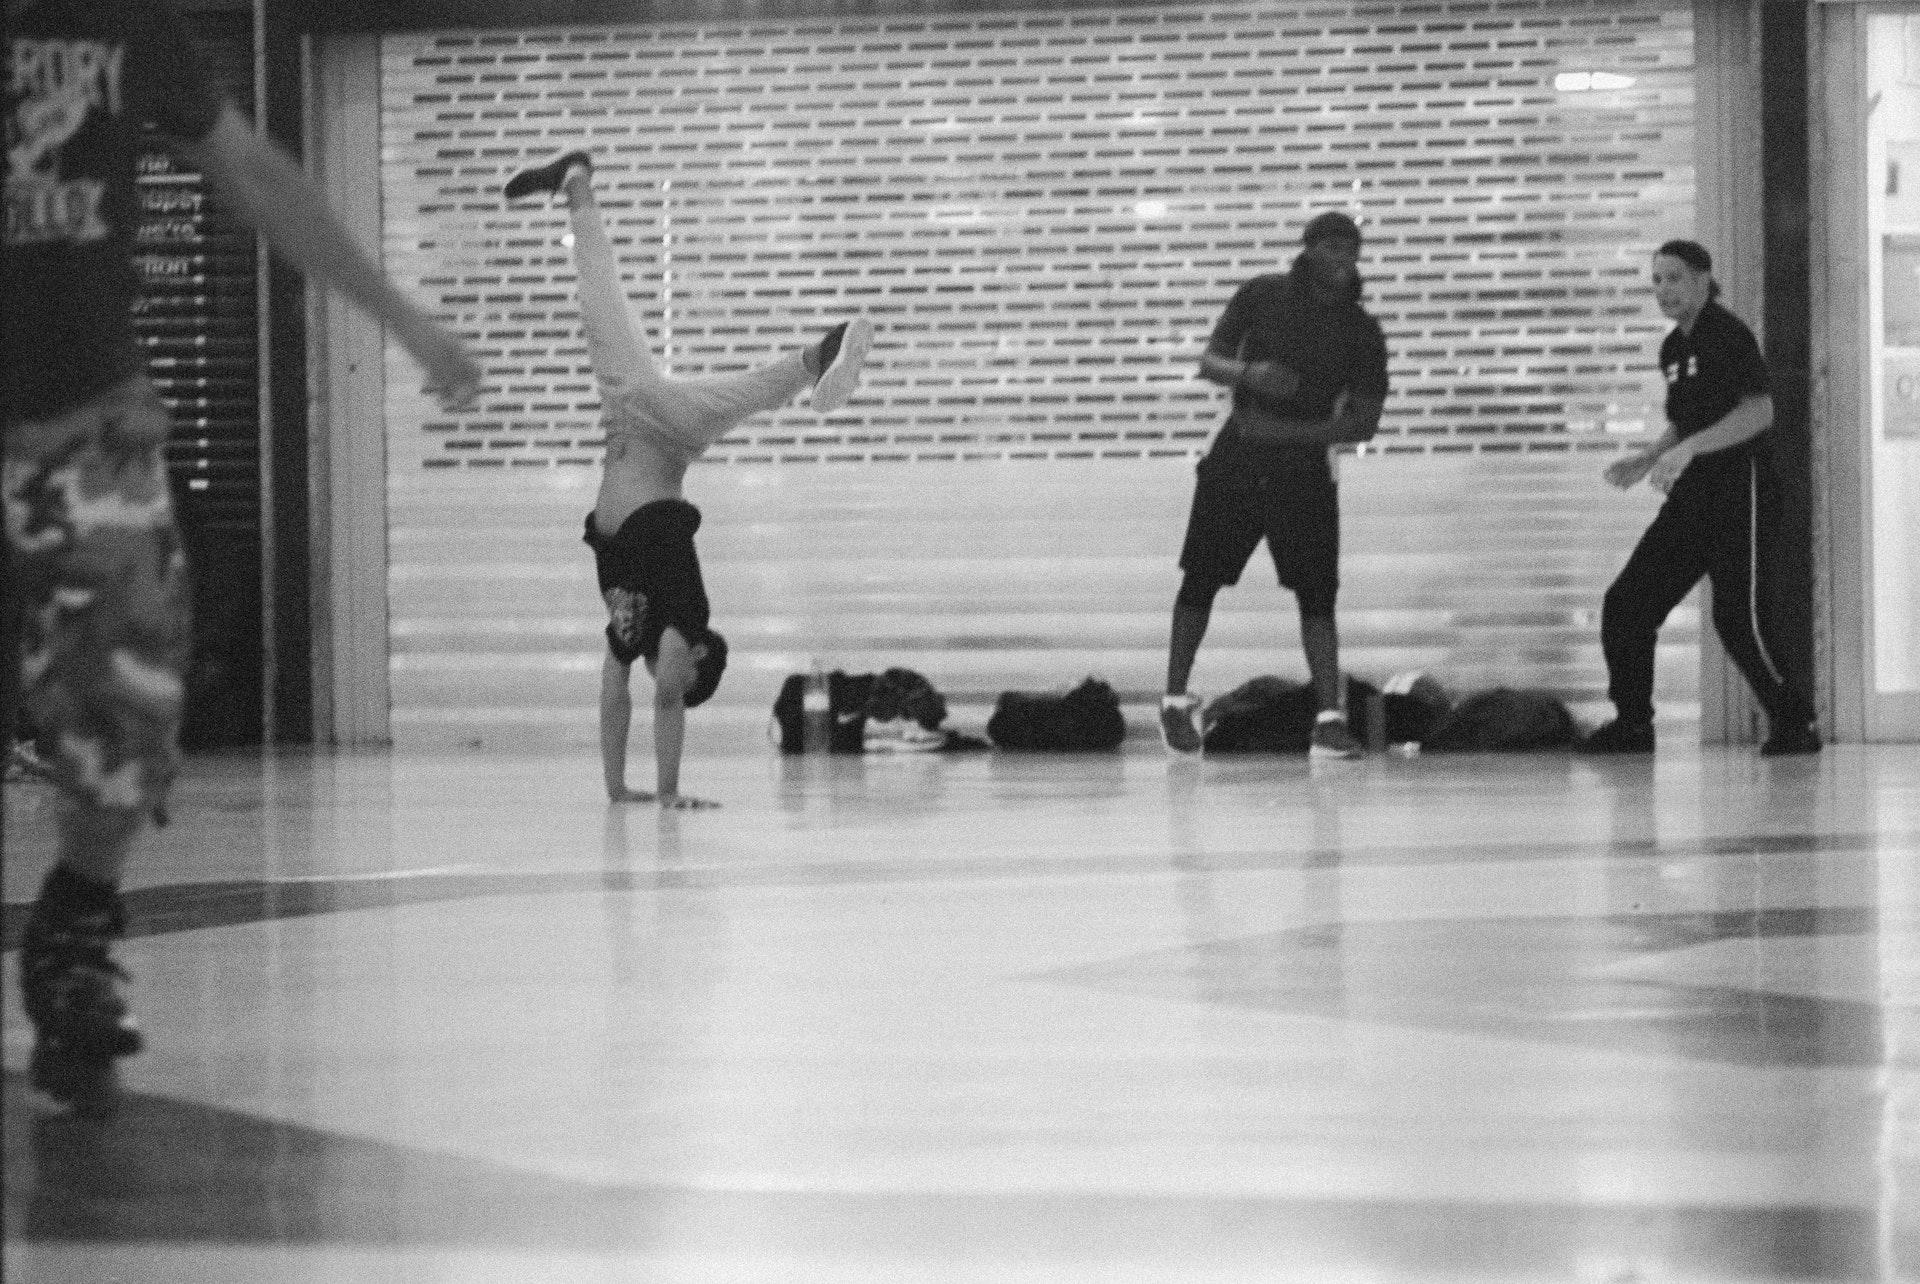 Stratford_Centre_Skaters_Lighter-42